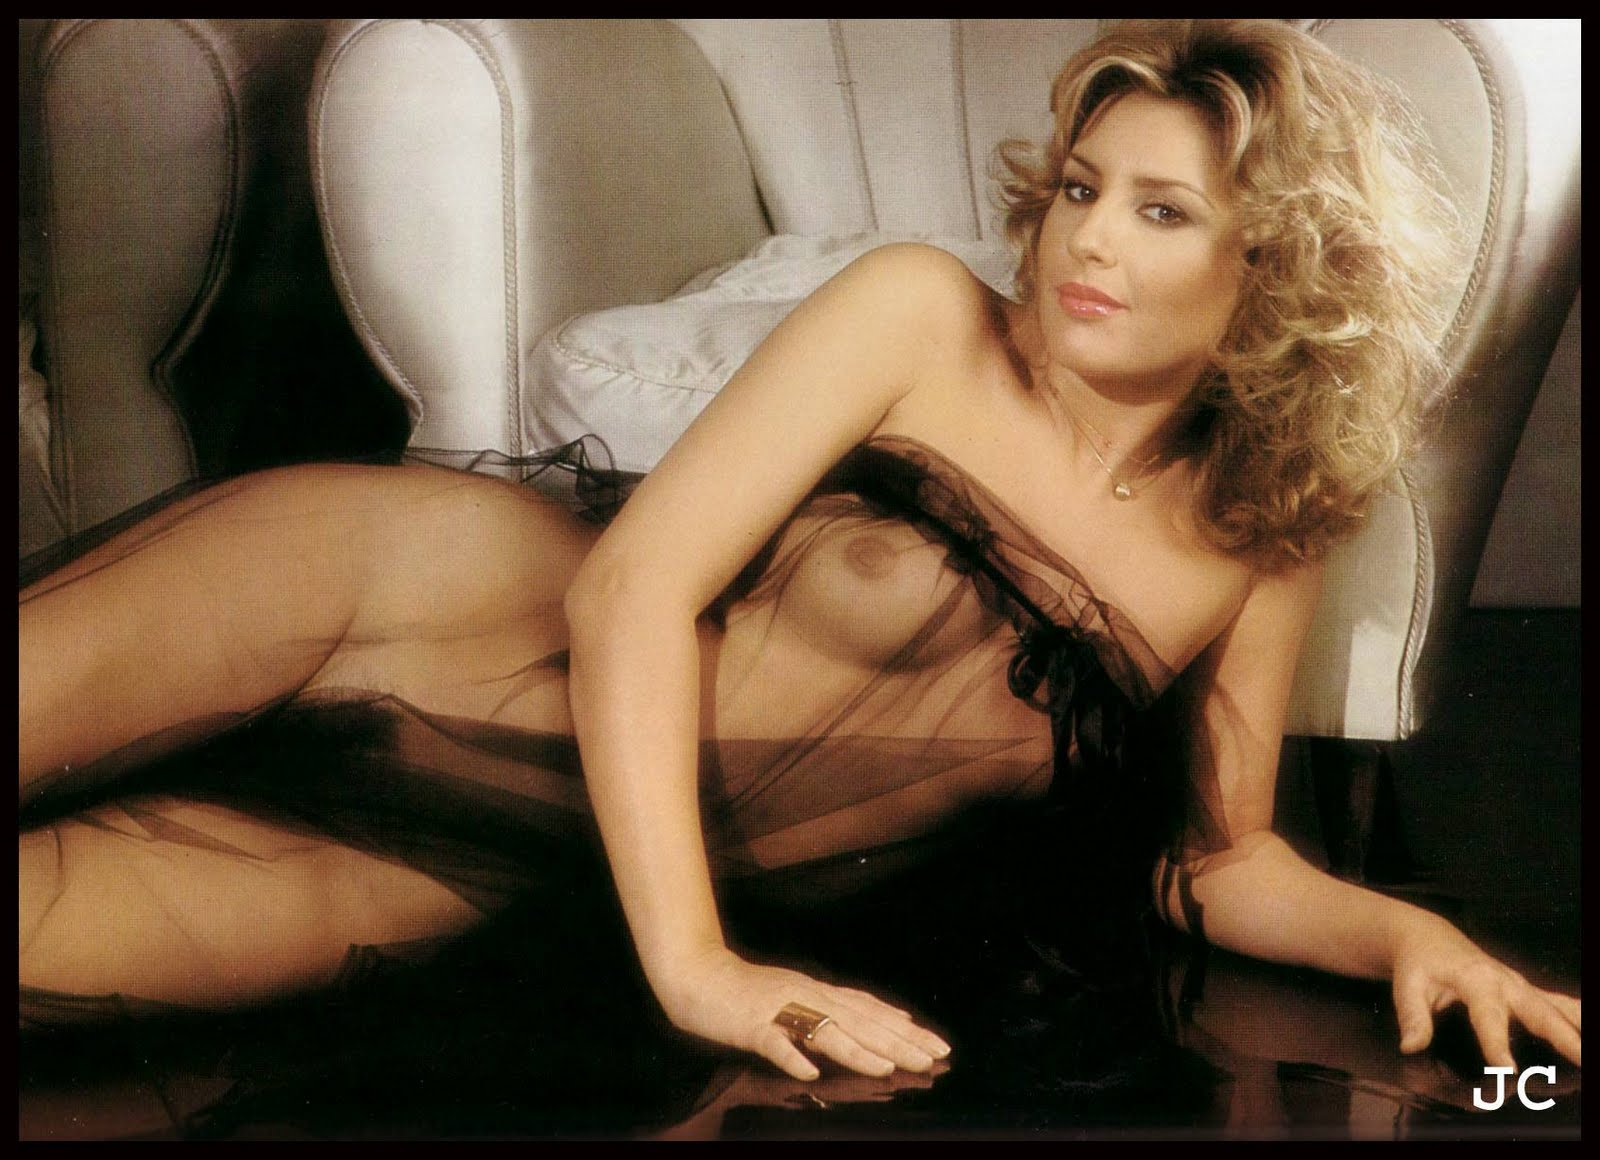 ultimi film hard usciti escort massaggi